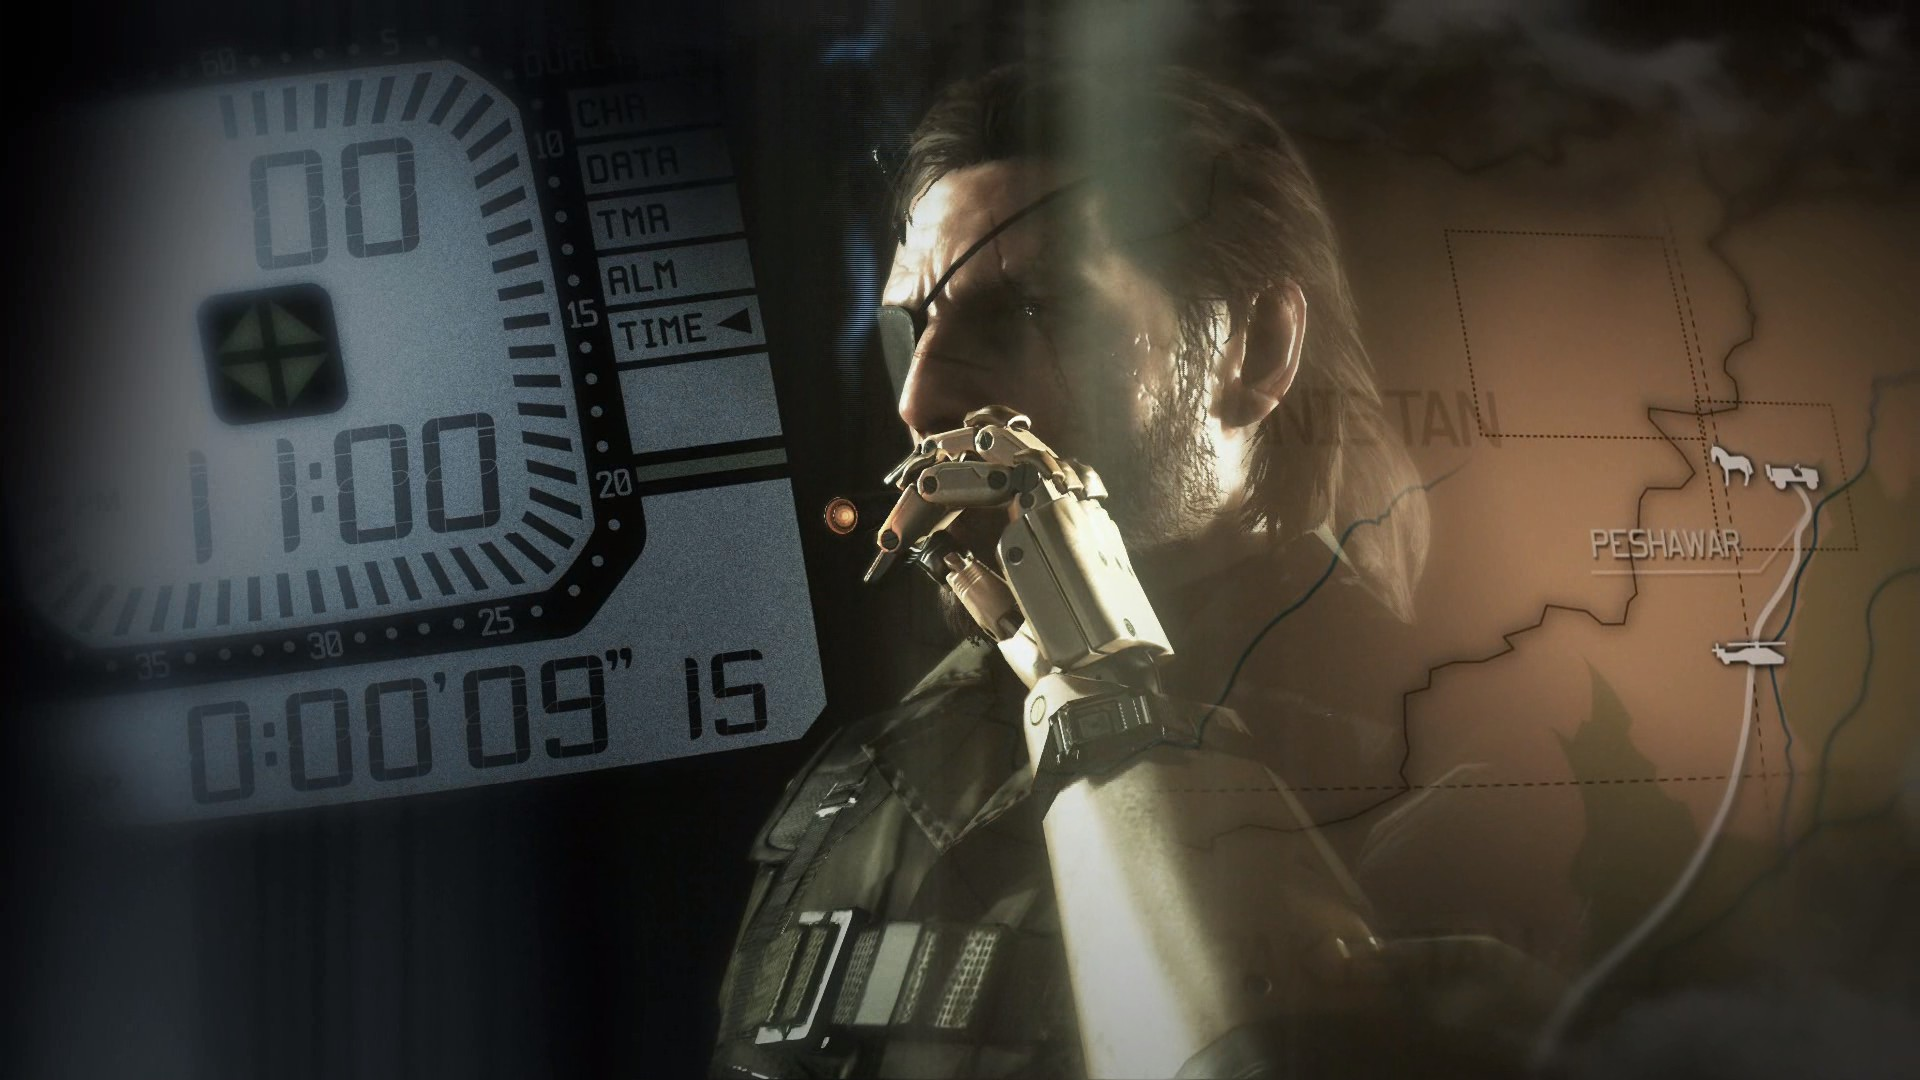 загруженное (27).jpg - Metal Gear Solid 5: The Phantom Pain